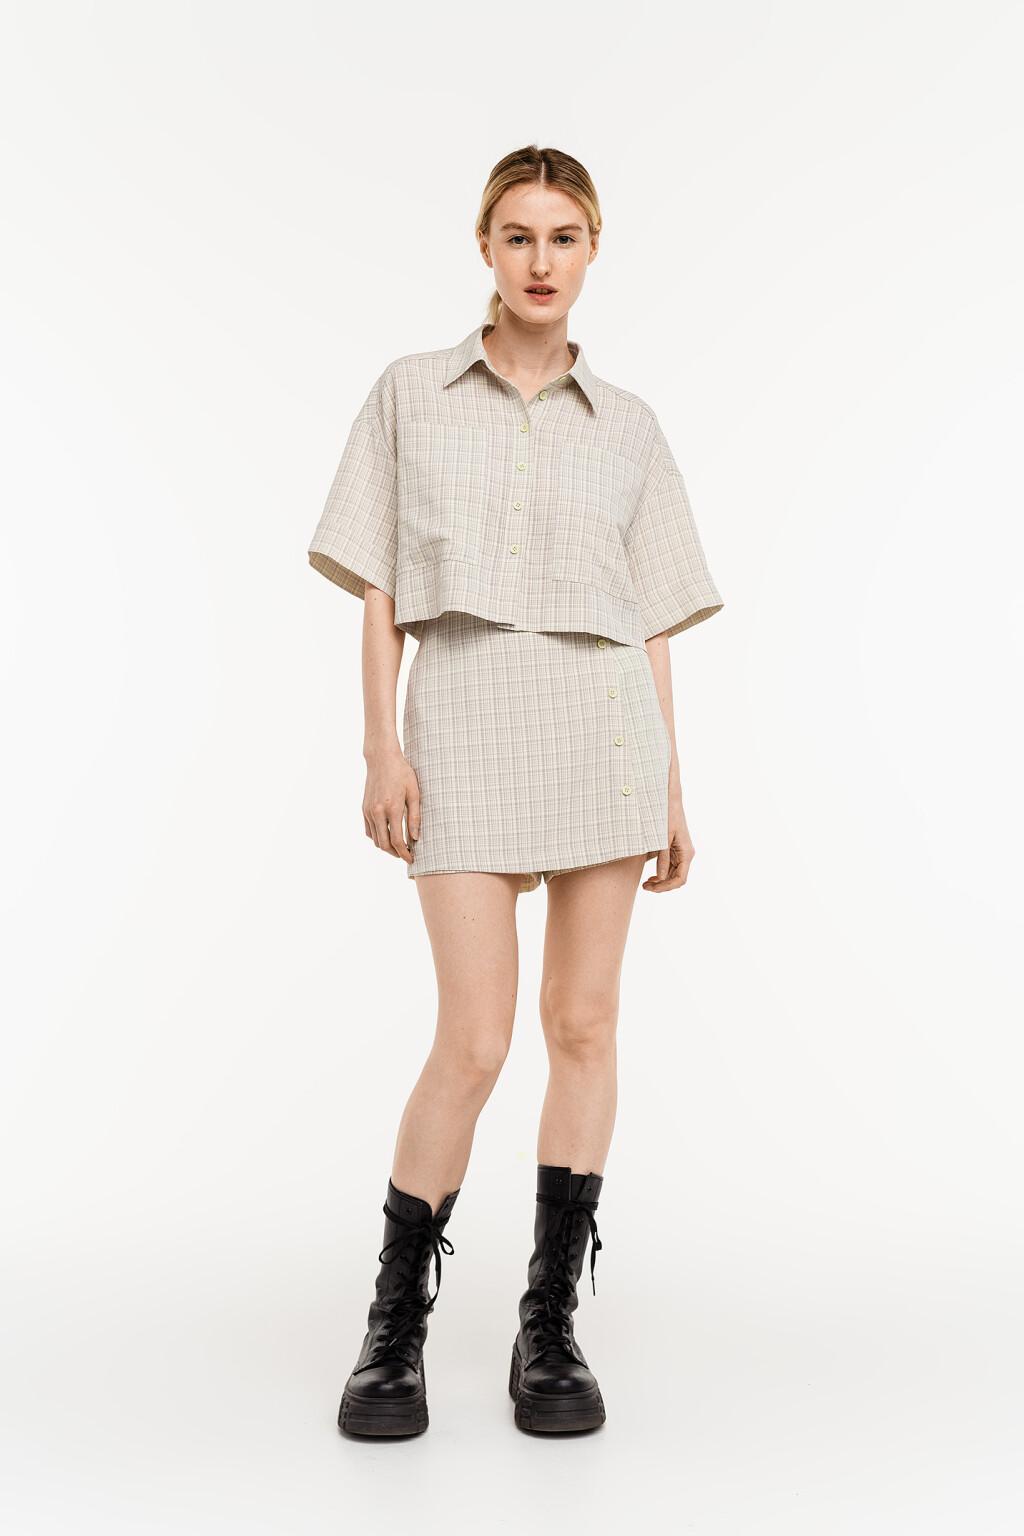 юбка-шорты женская